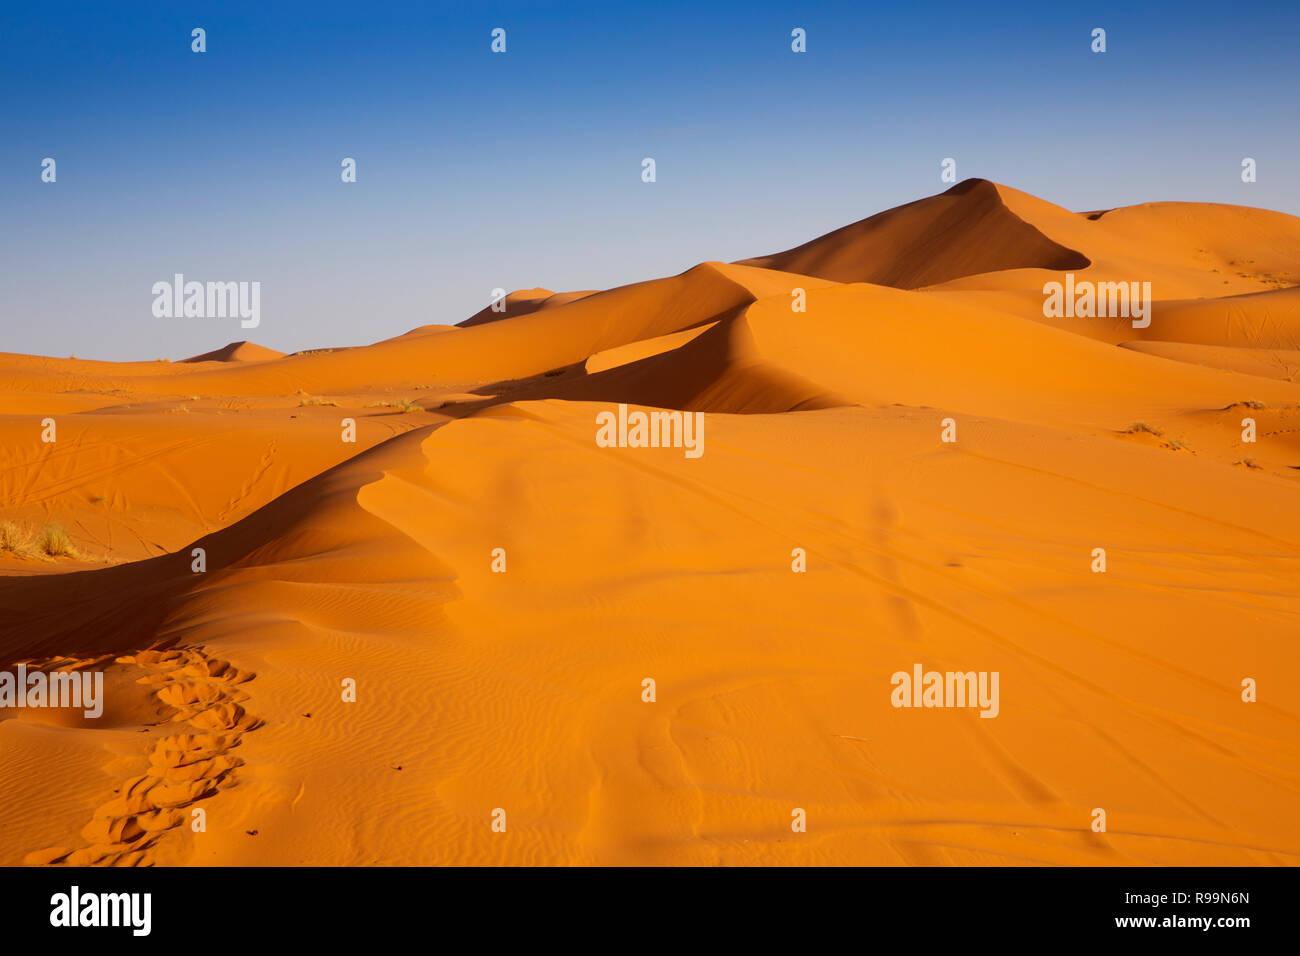 Morocco, Errachidia Province, Erg Chebbi, sand dunes at sunset Stock Photo